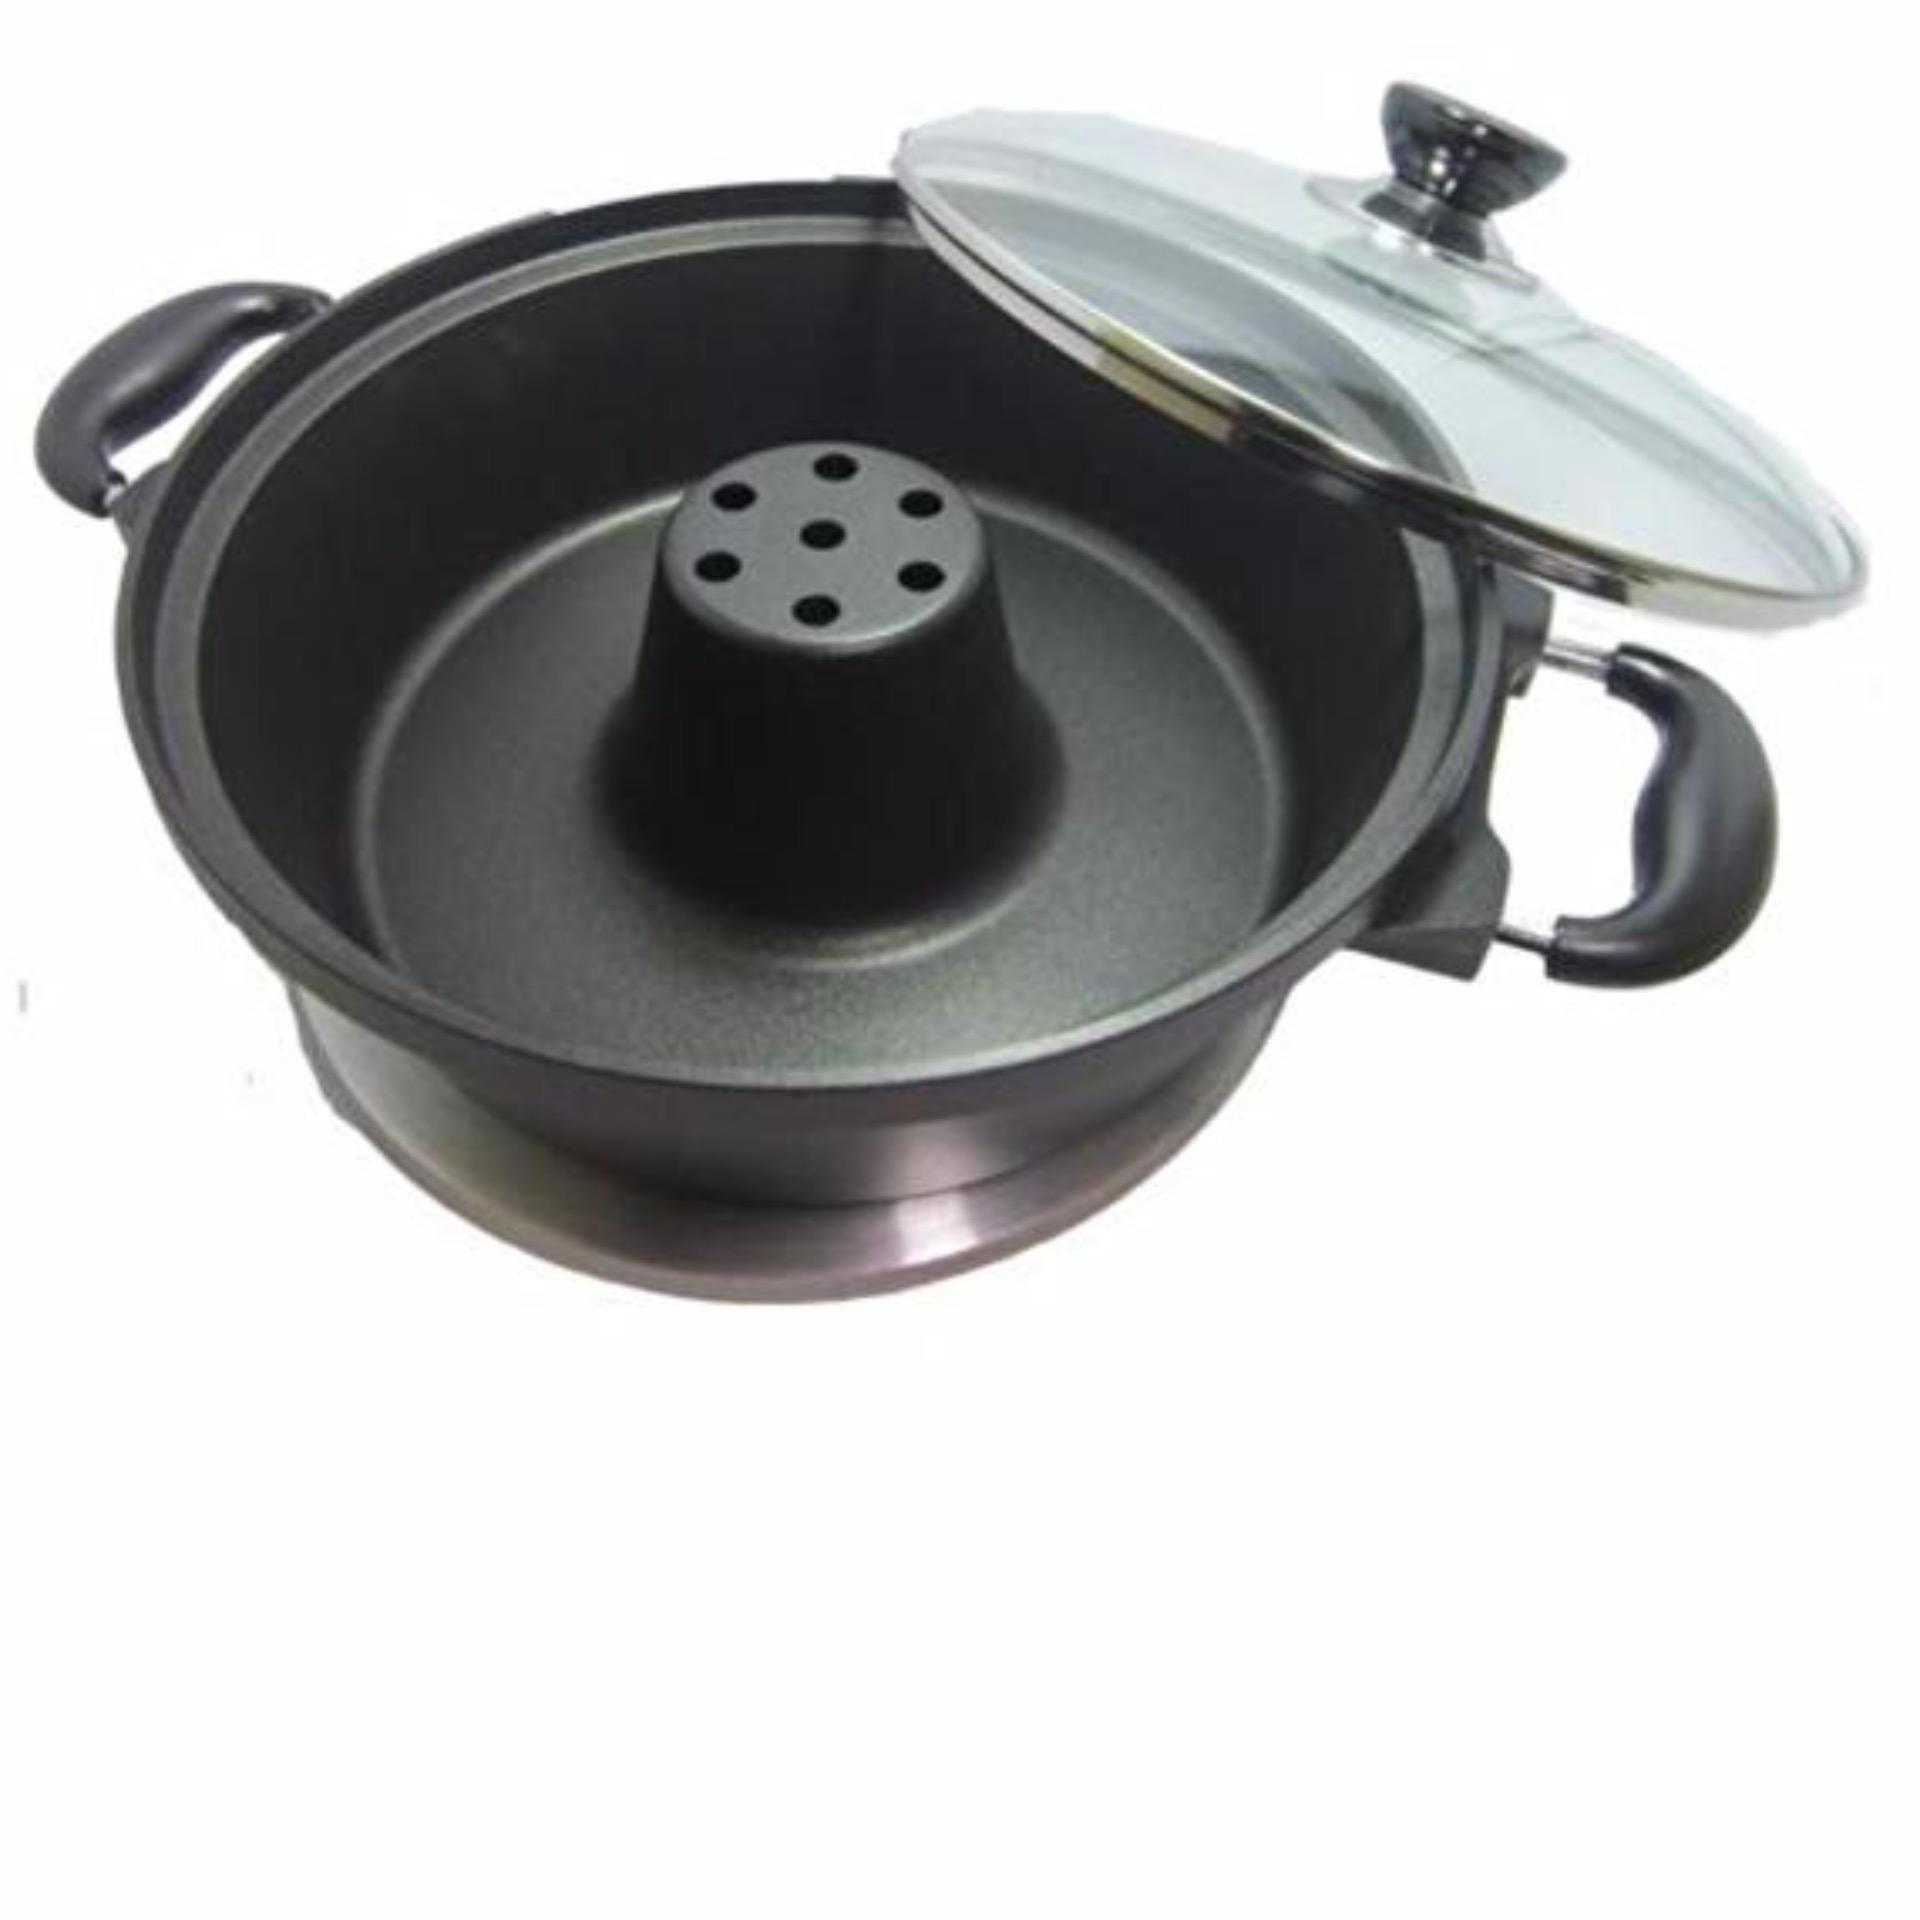 Toko Best Cetakan Bolu Baking Pan Maker Anti Lengket Bahan Tebal High Quality Hitam Dki Jakarta